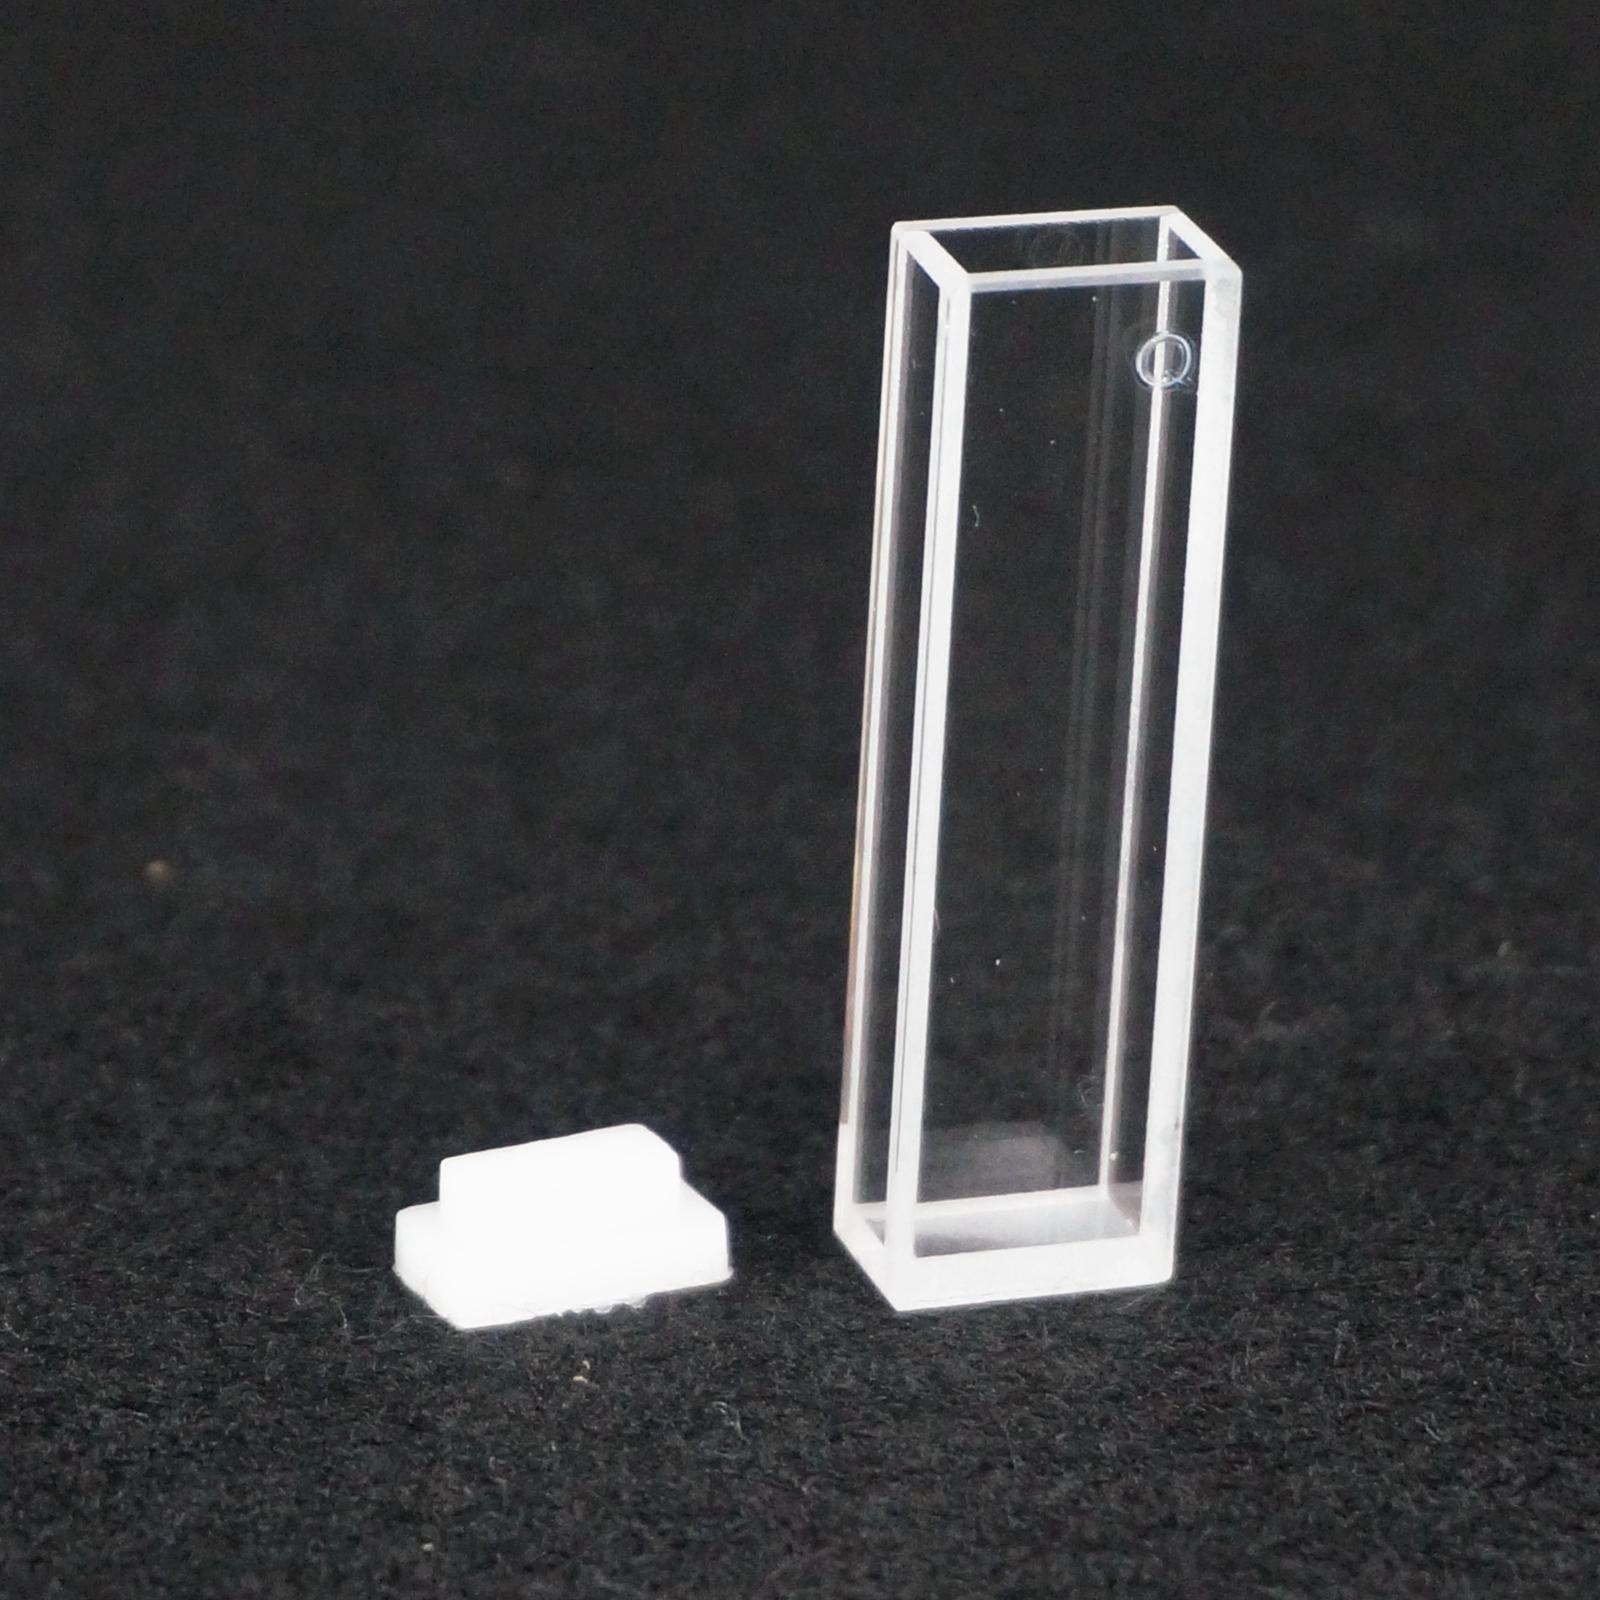 5mm x10mm Path Length JGS1 Quartz Cuvette Cell With Telfon Lid For Fluorescence Spectrometer 1pcs 5mm path length jgs1 quartz cuvette cell with with screw cap for spectrometer 4 widows